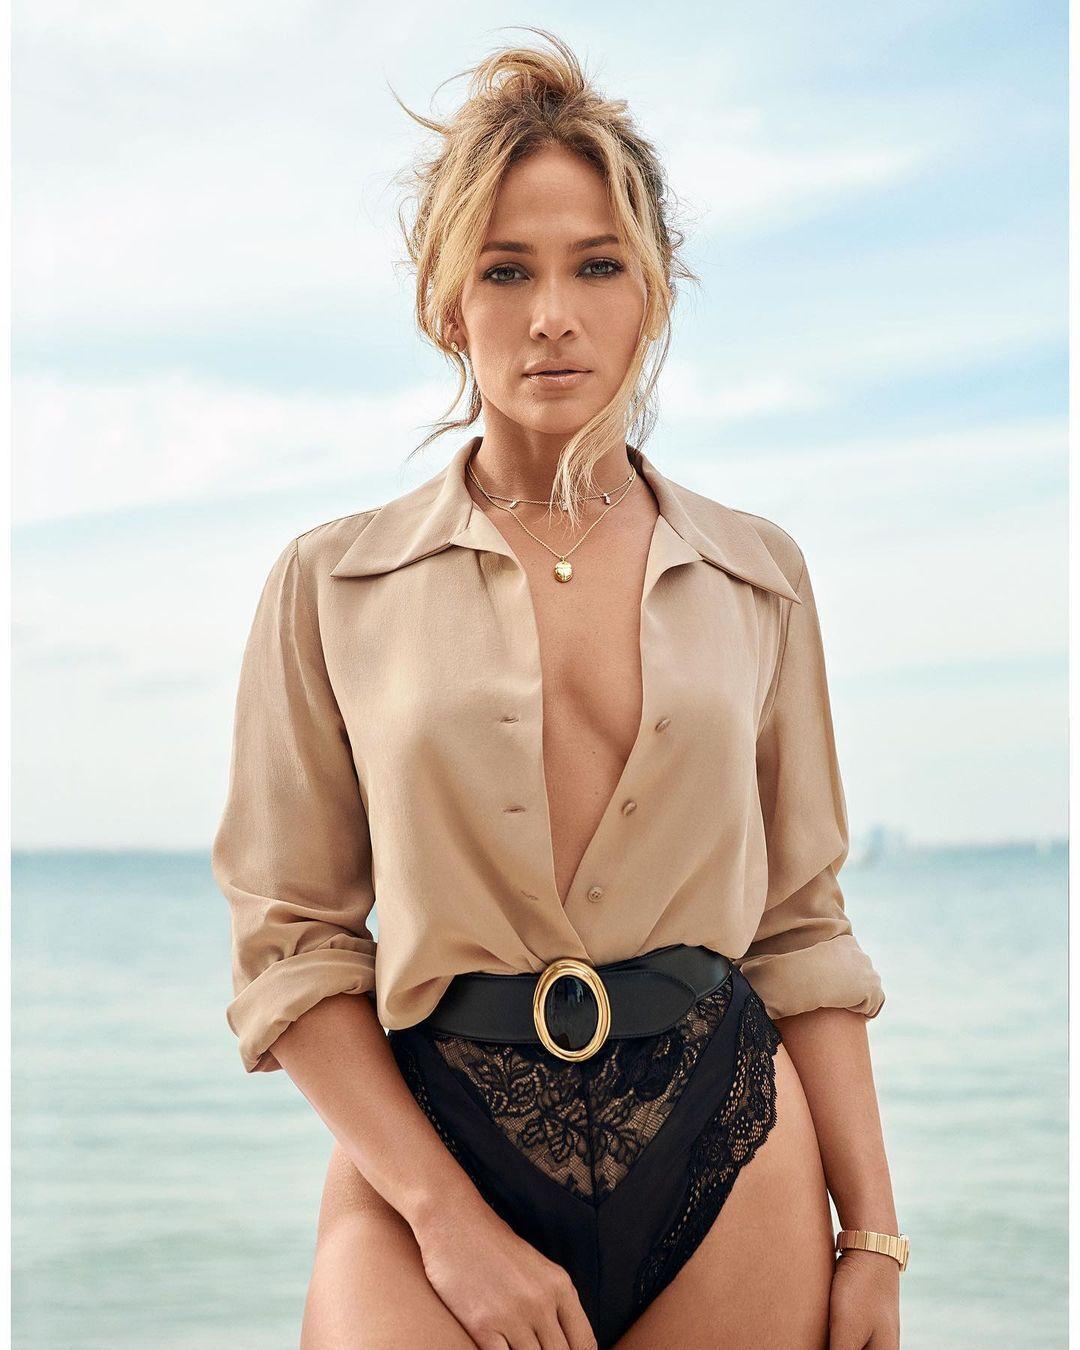 Также певица примерила рубашку песочного оттенка